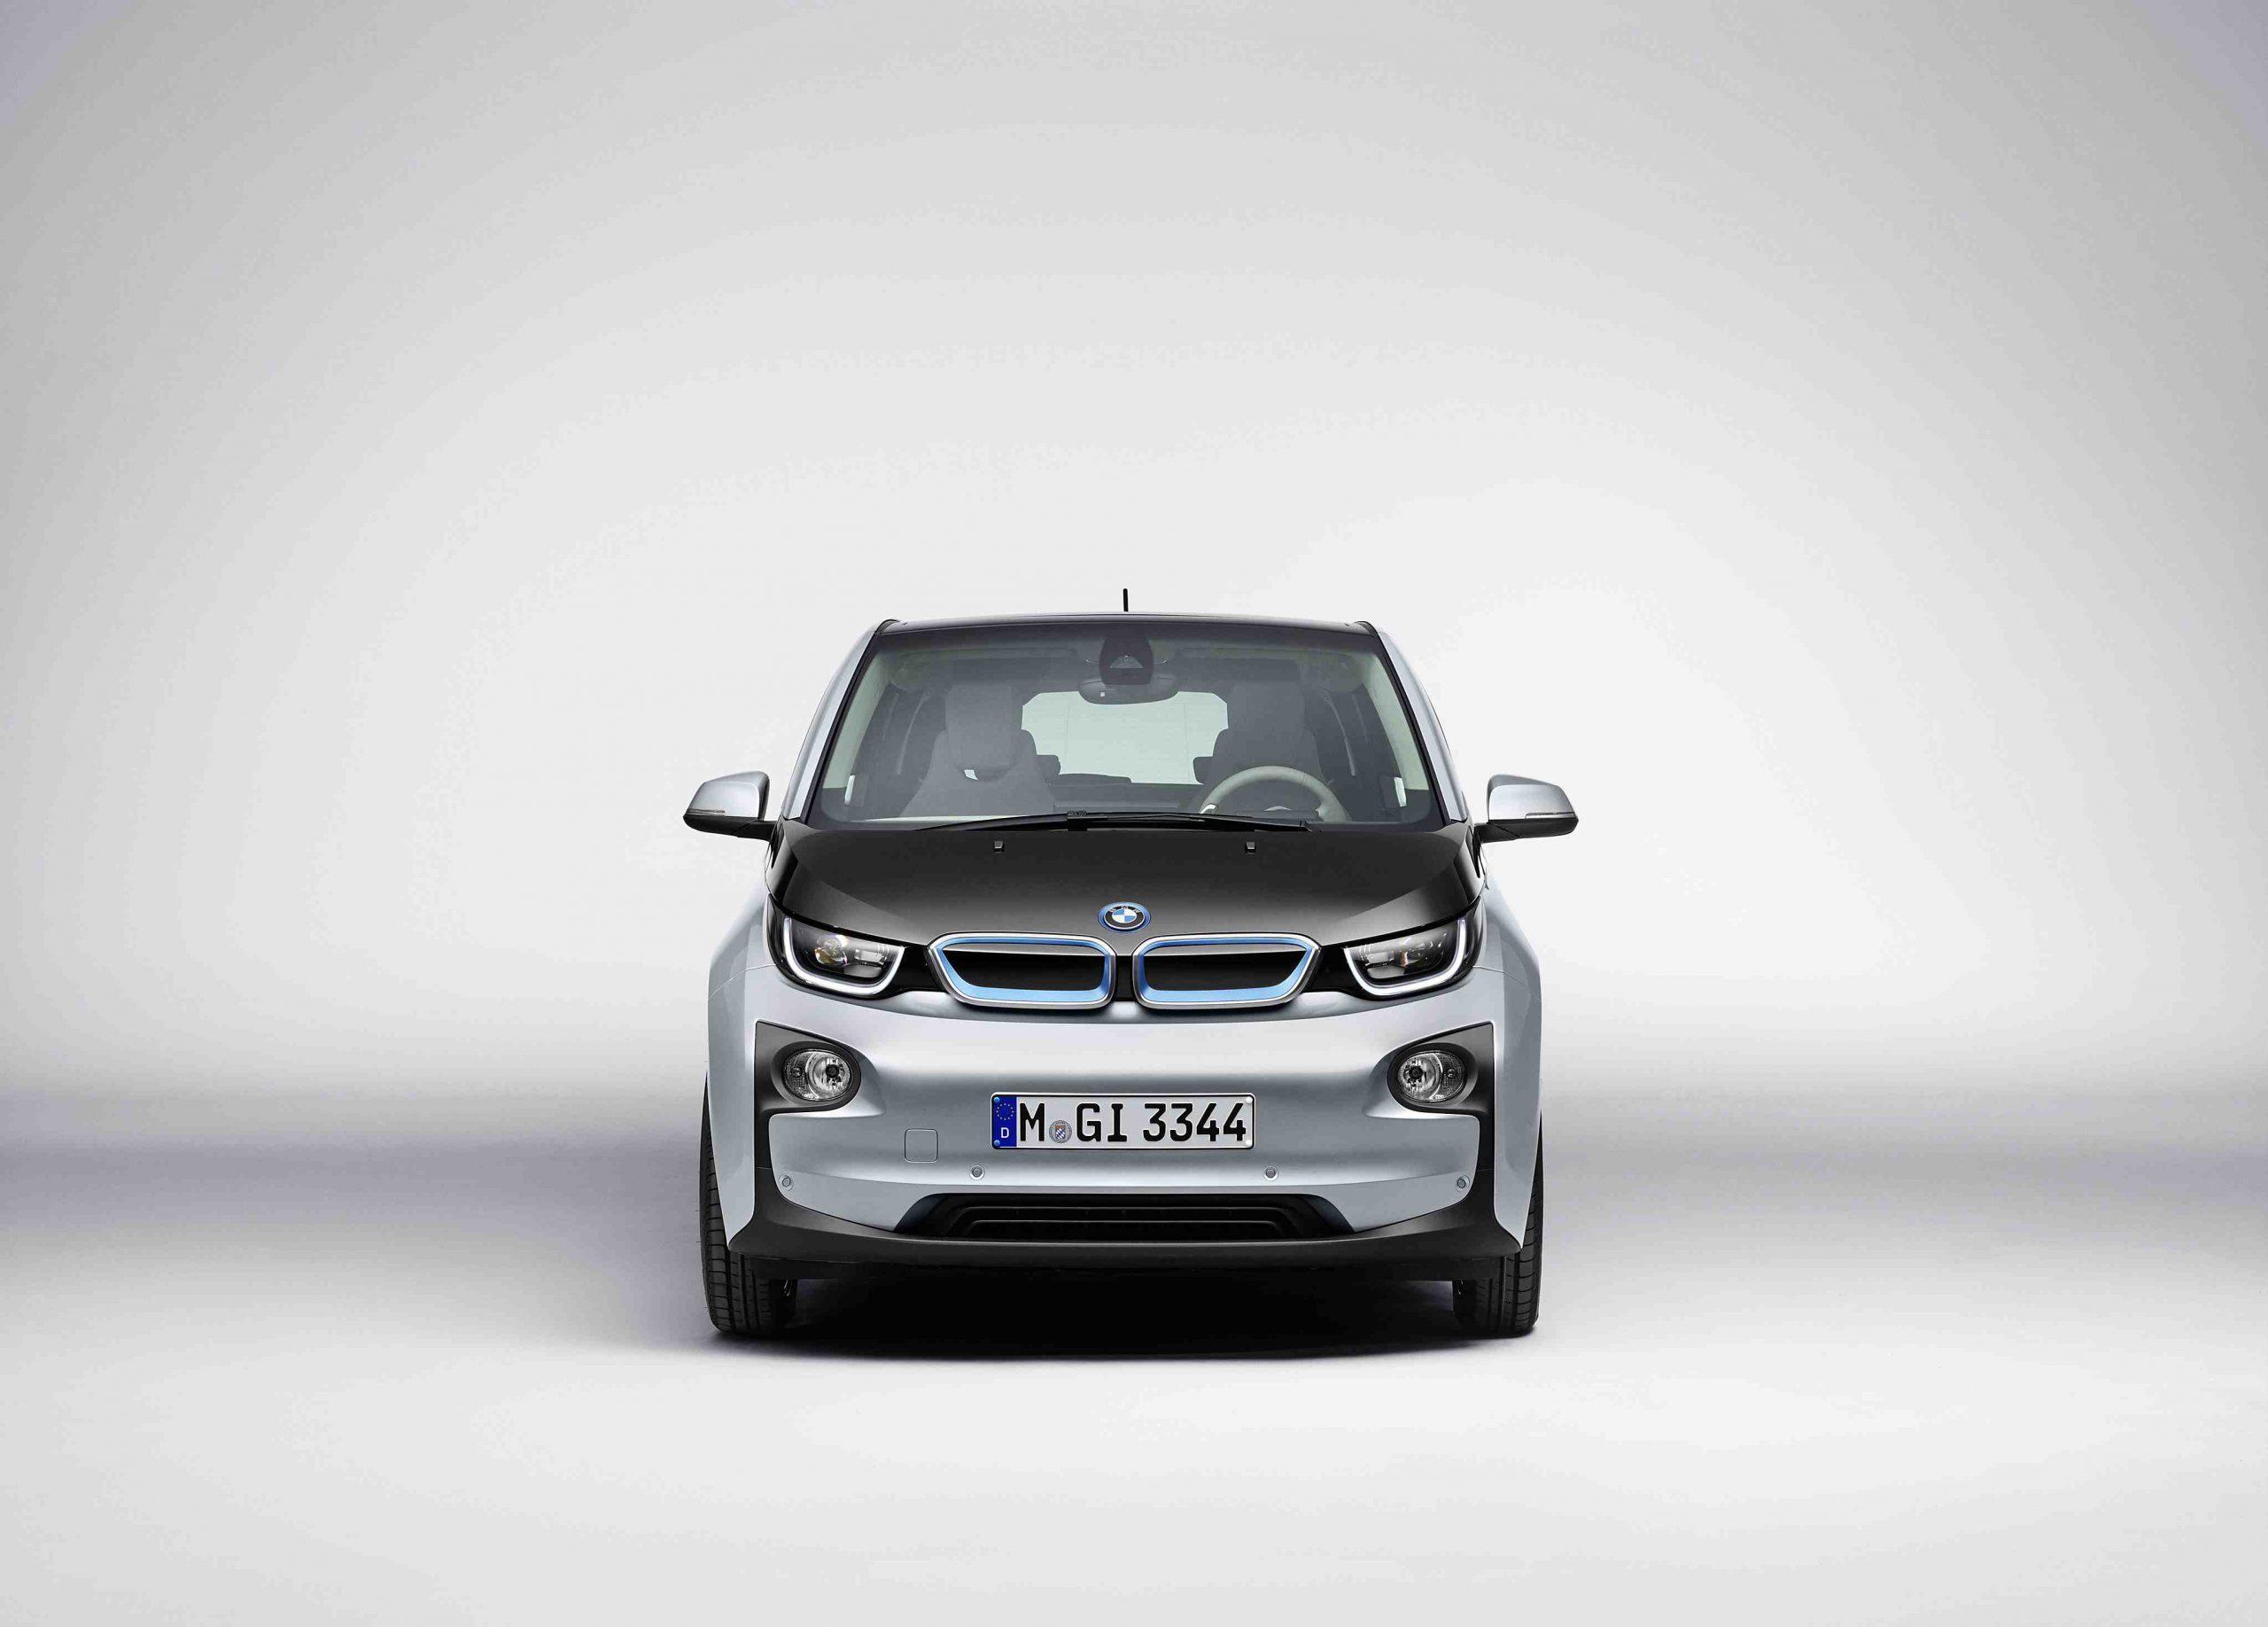 Electric BMW i3 Detailed – Big On Carbon Fibre, Low Carbon Footprint